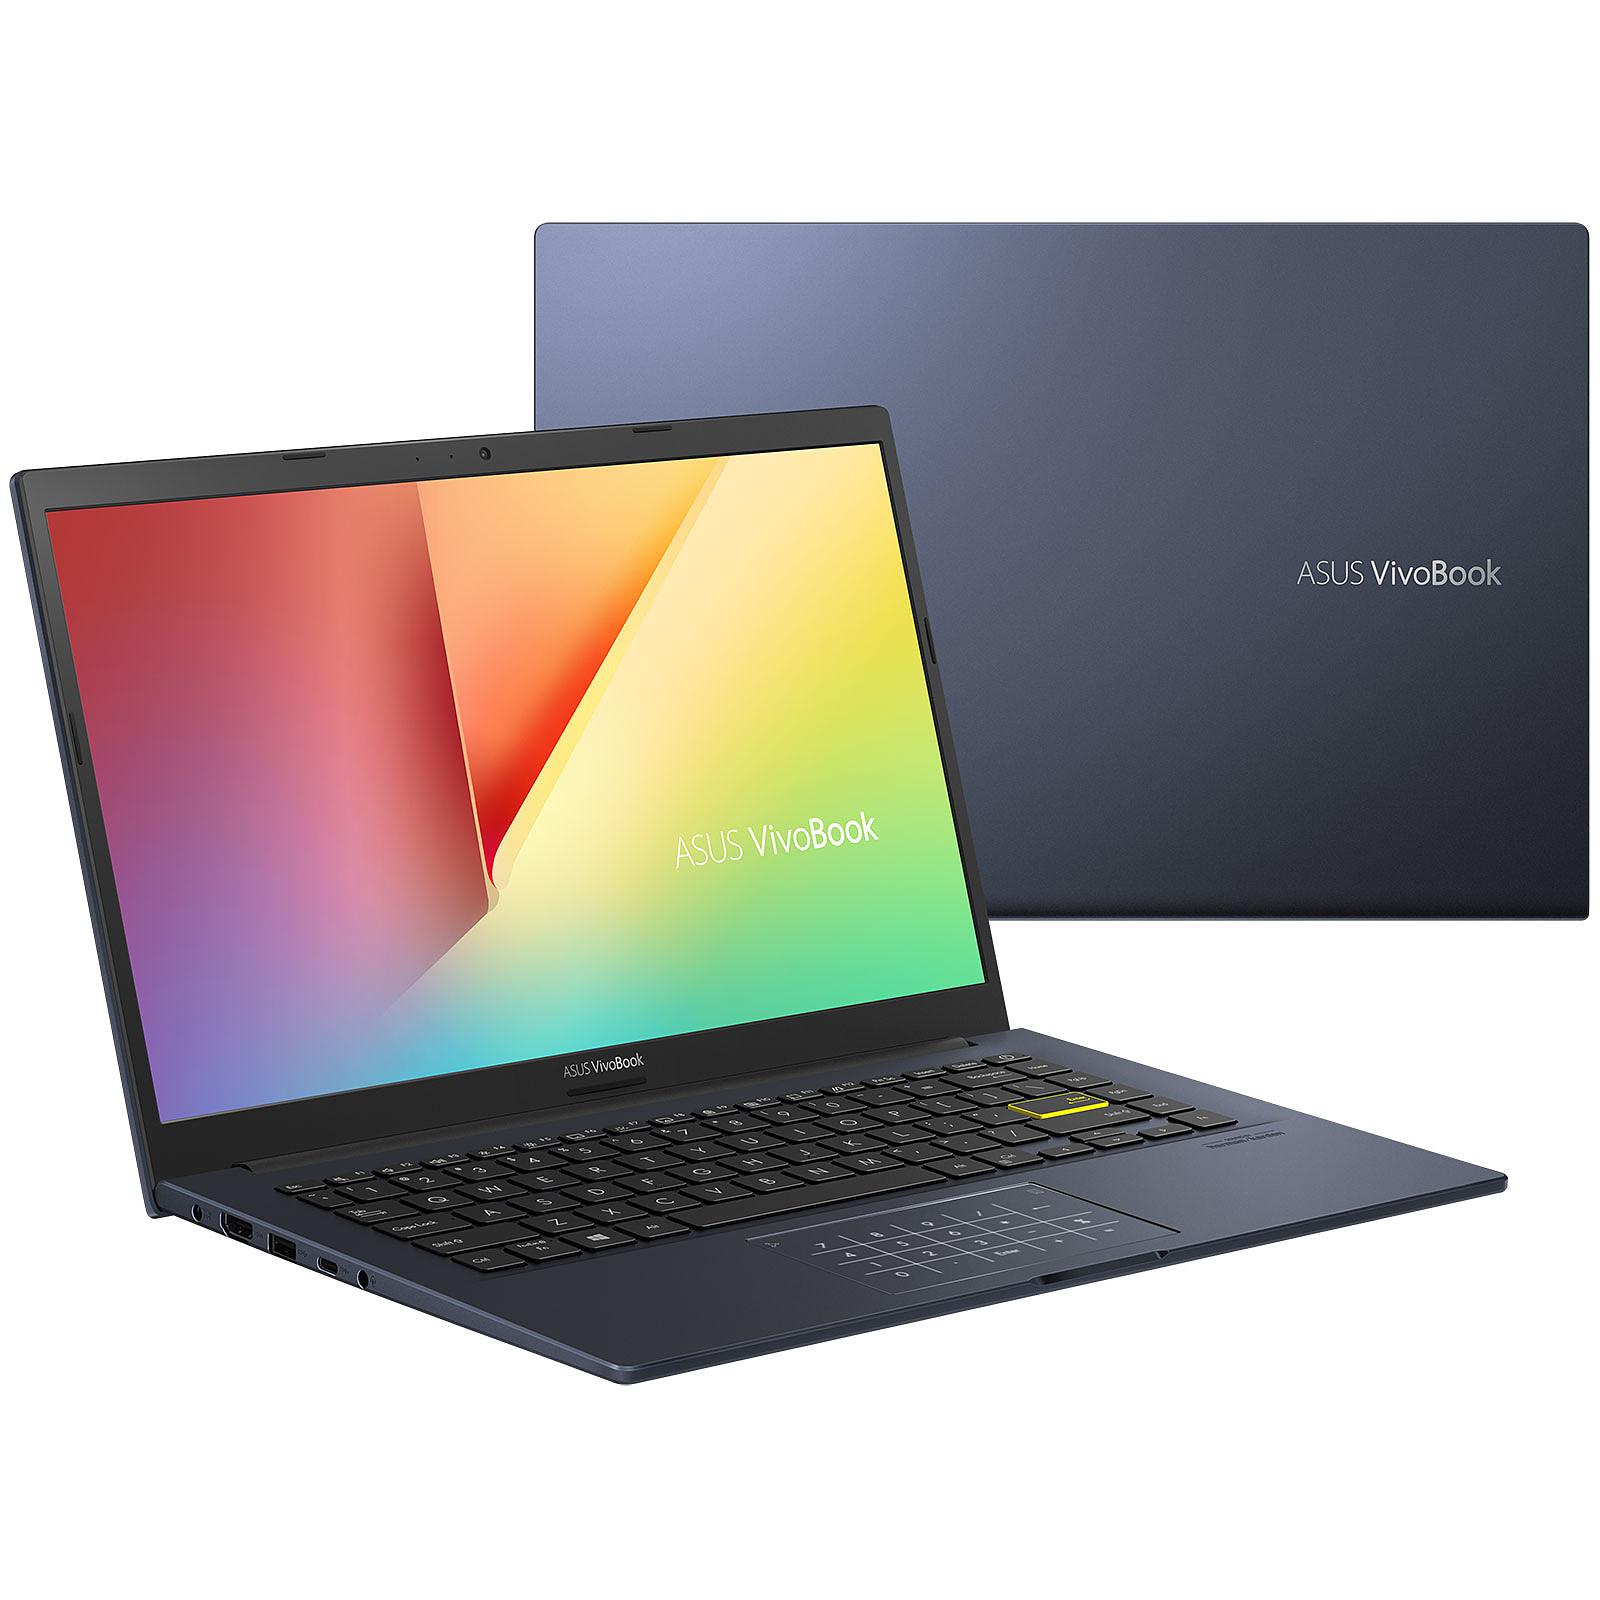 ASUS Vivobook S14 S413IA-EK207T avec NumPad